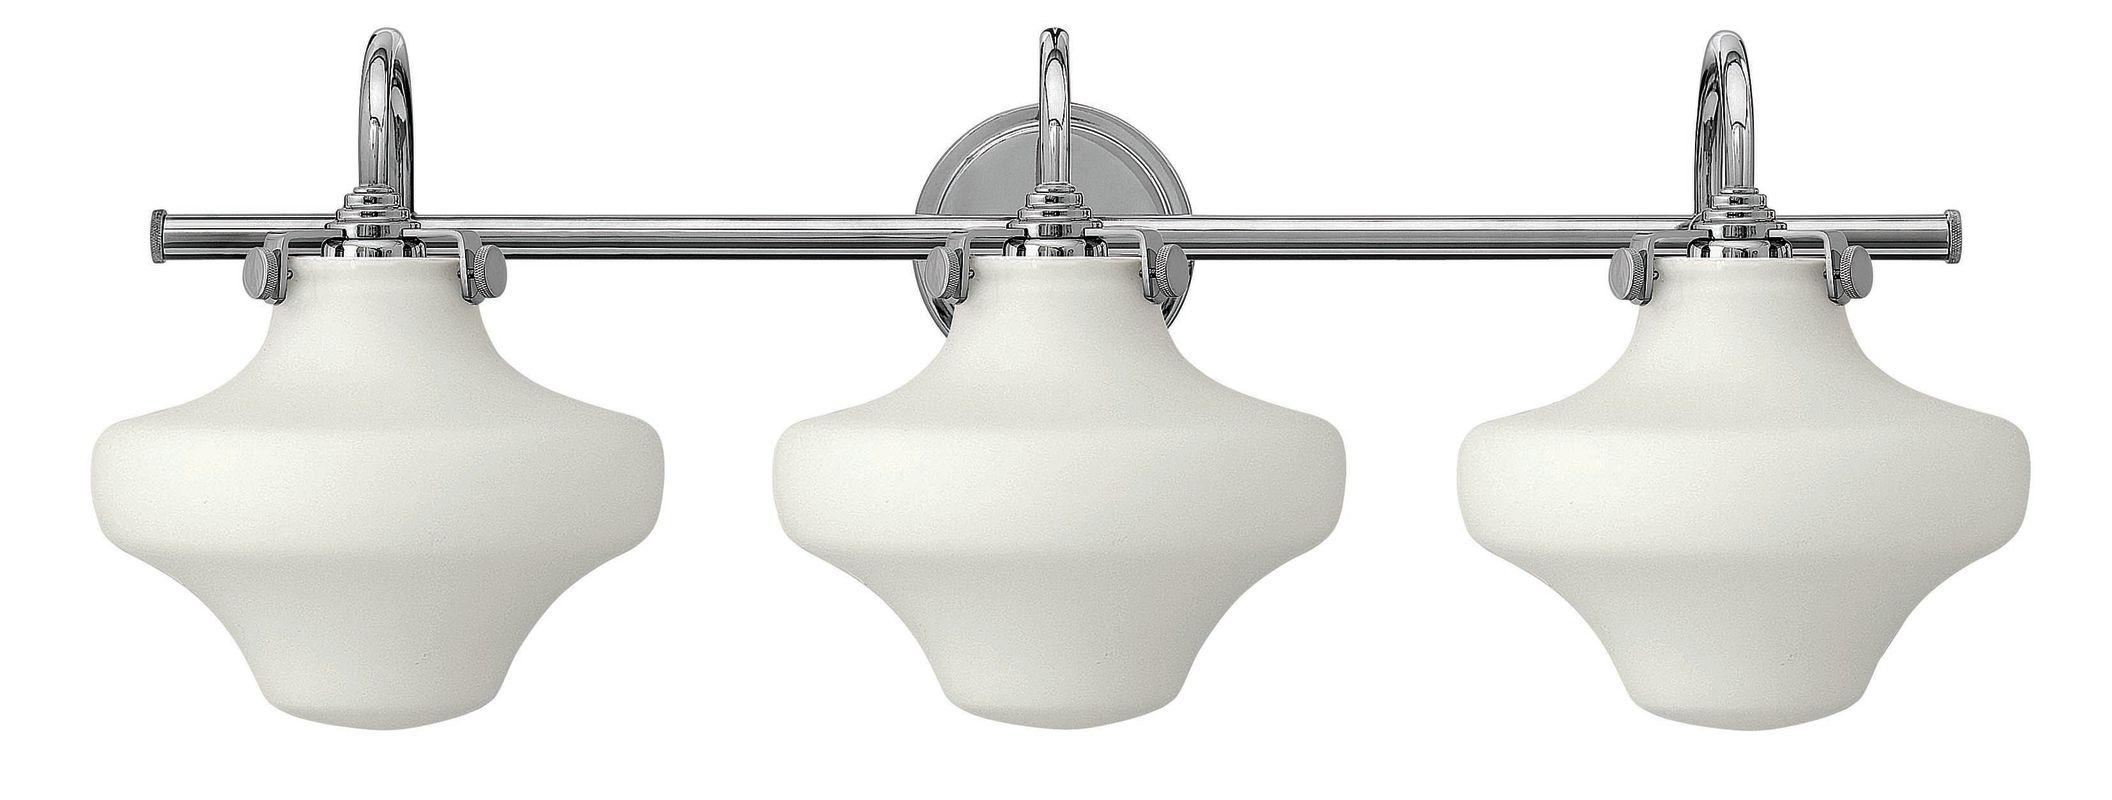 "Hinkley Lighting 50035 3 Light 30"" Width Bathroom Vanity Light with"